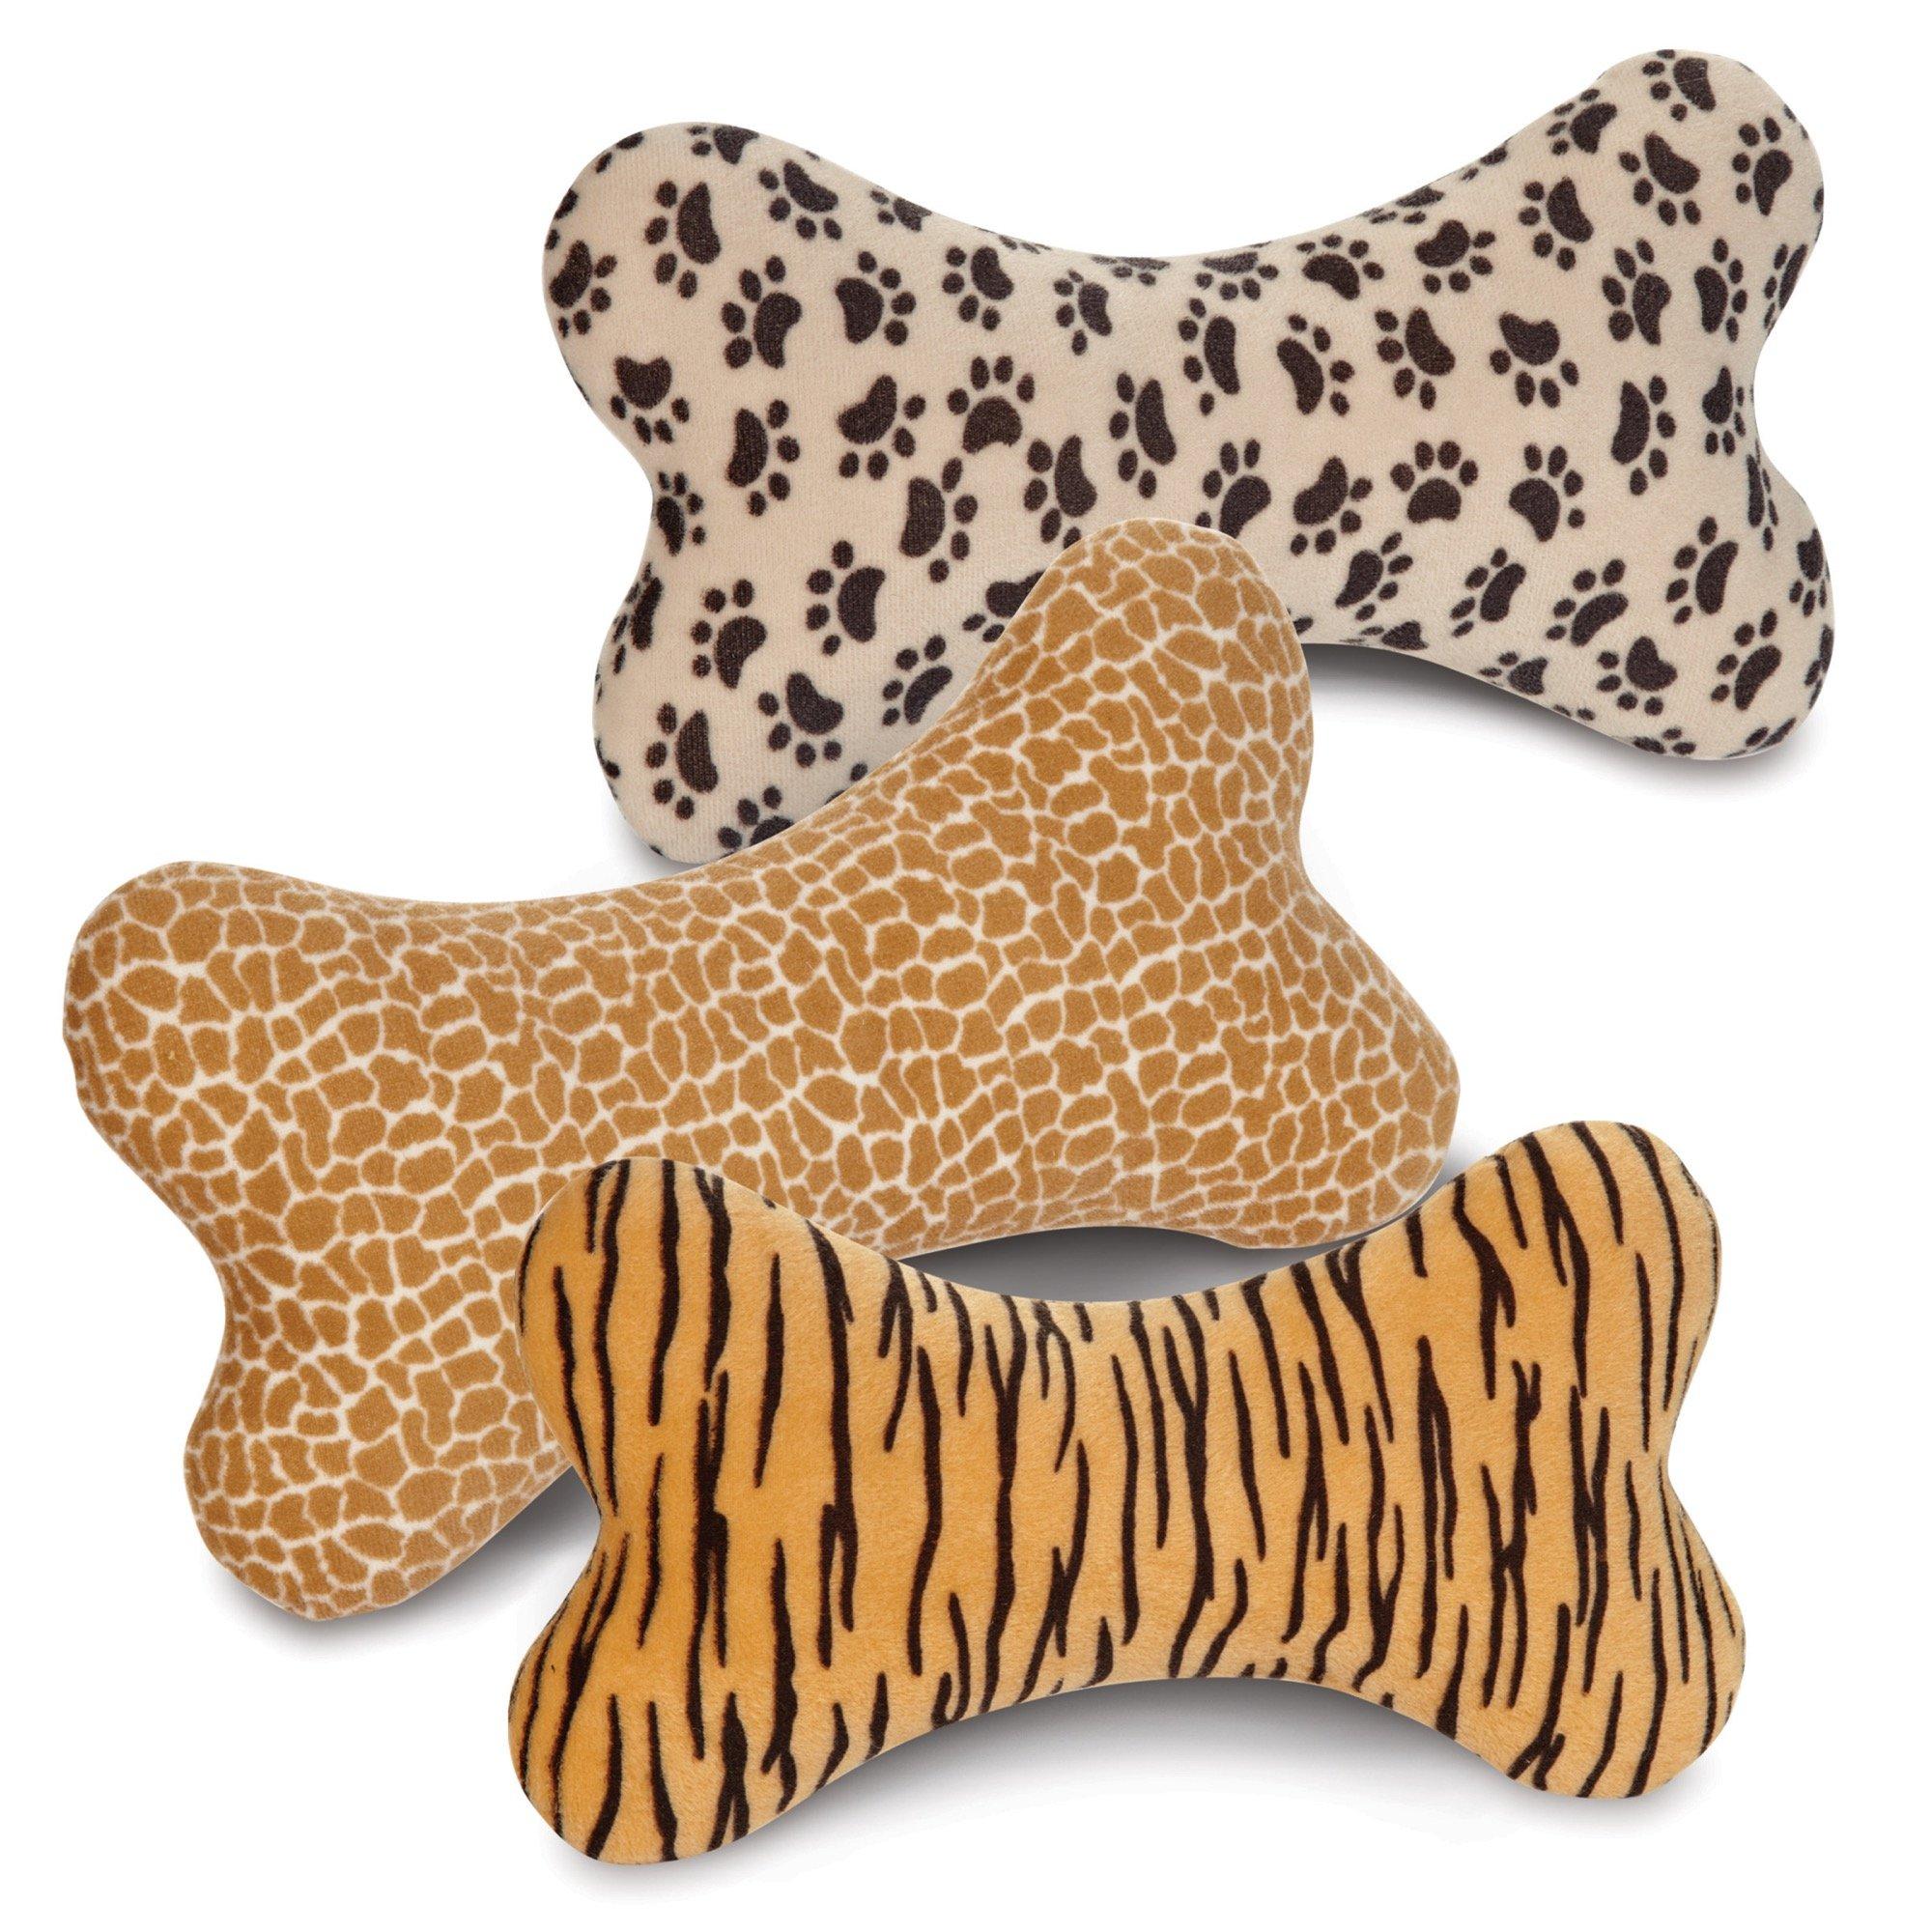 Zanies Wild Style Bone Pet Dog Toys 57 Piece Refill Pack